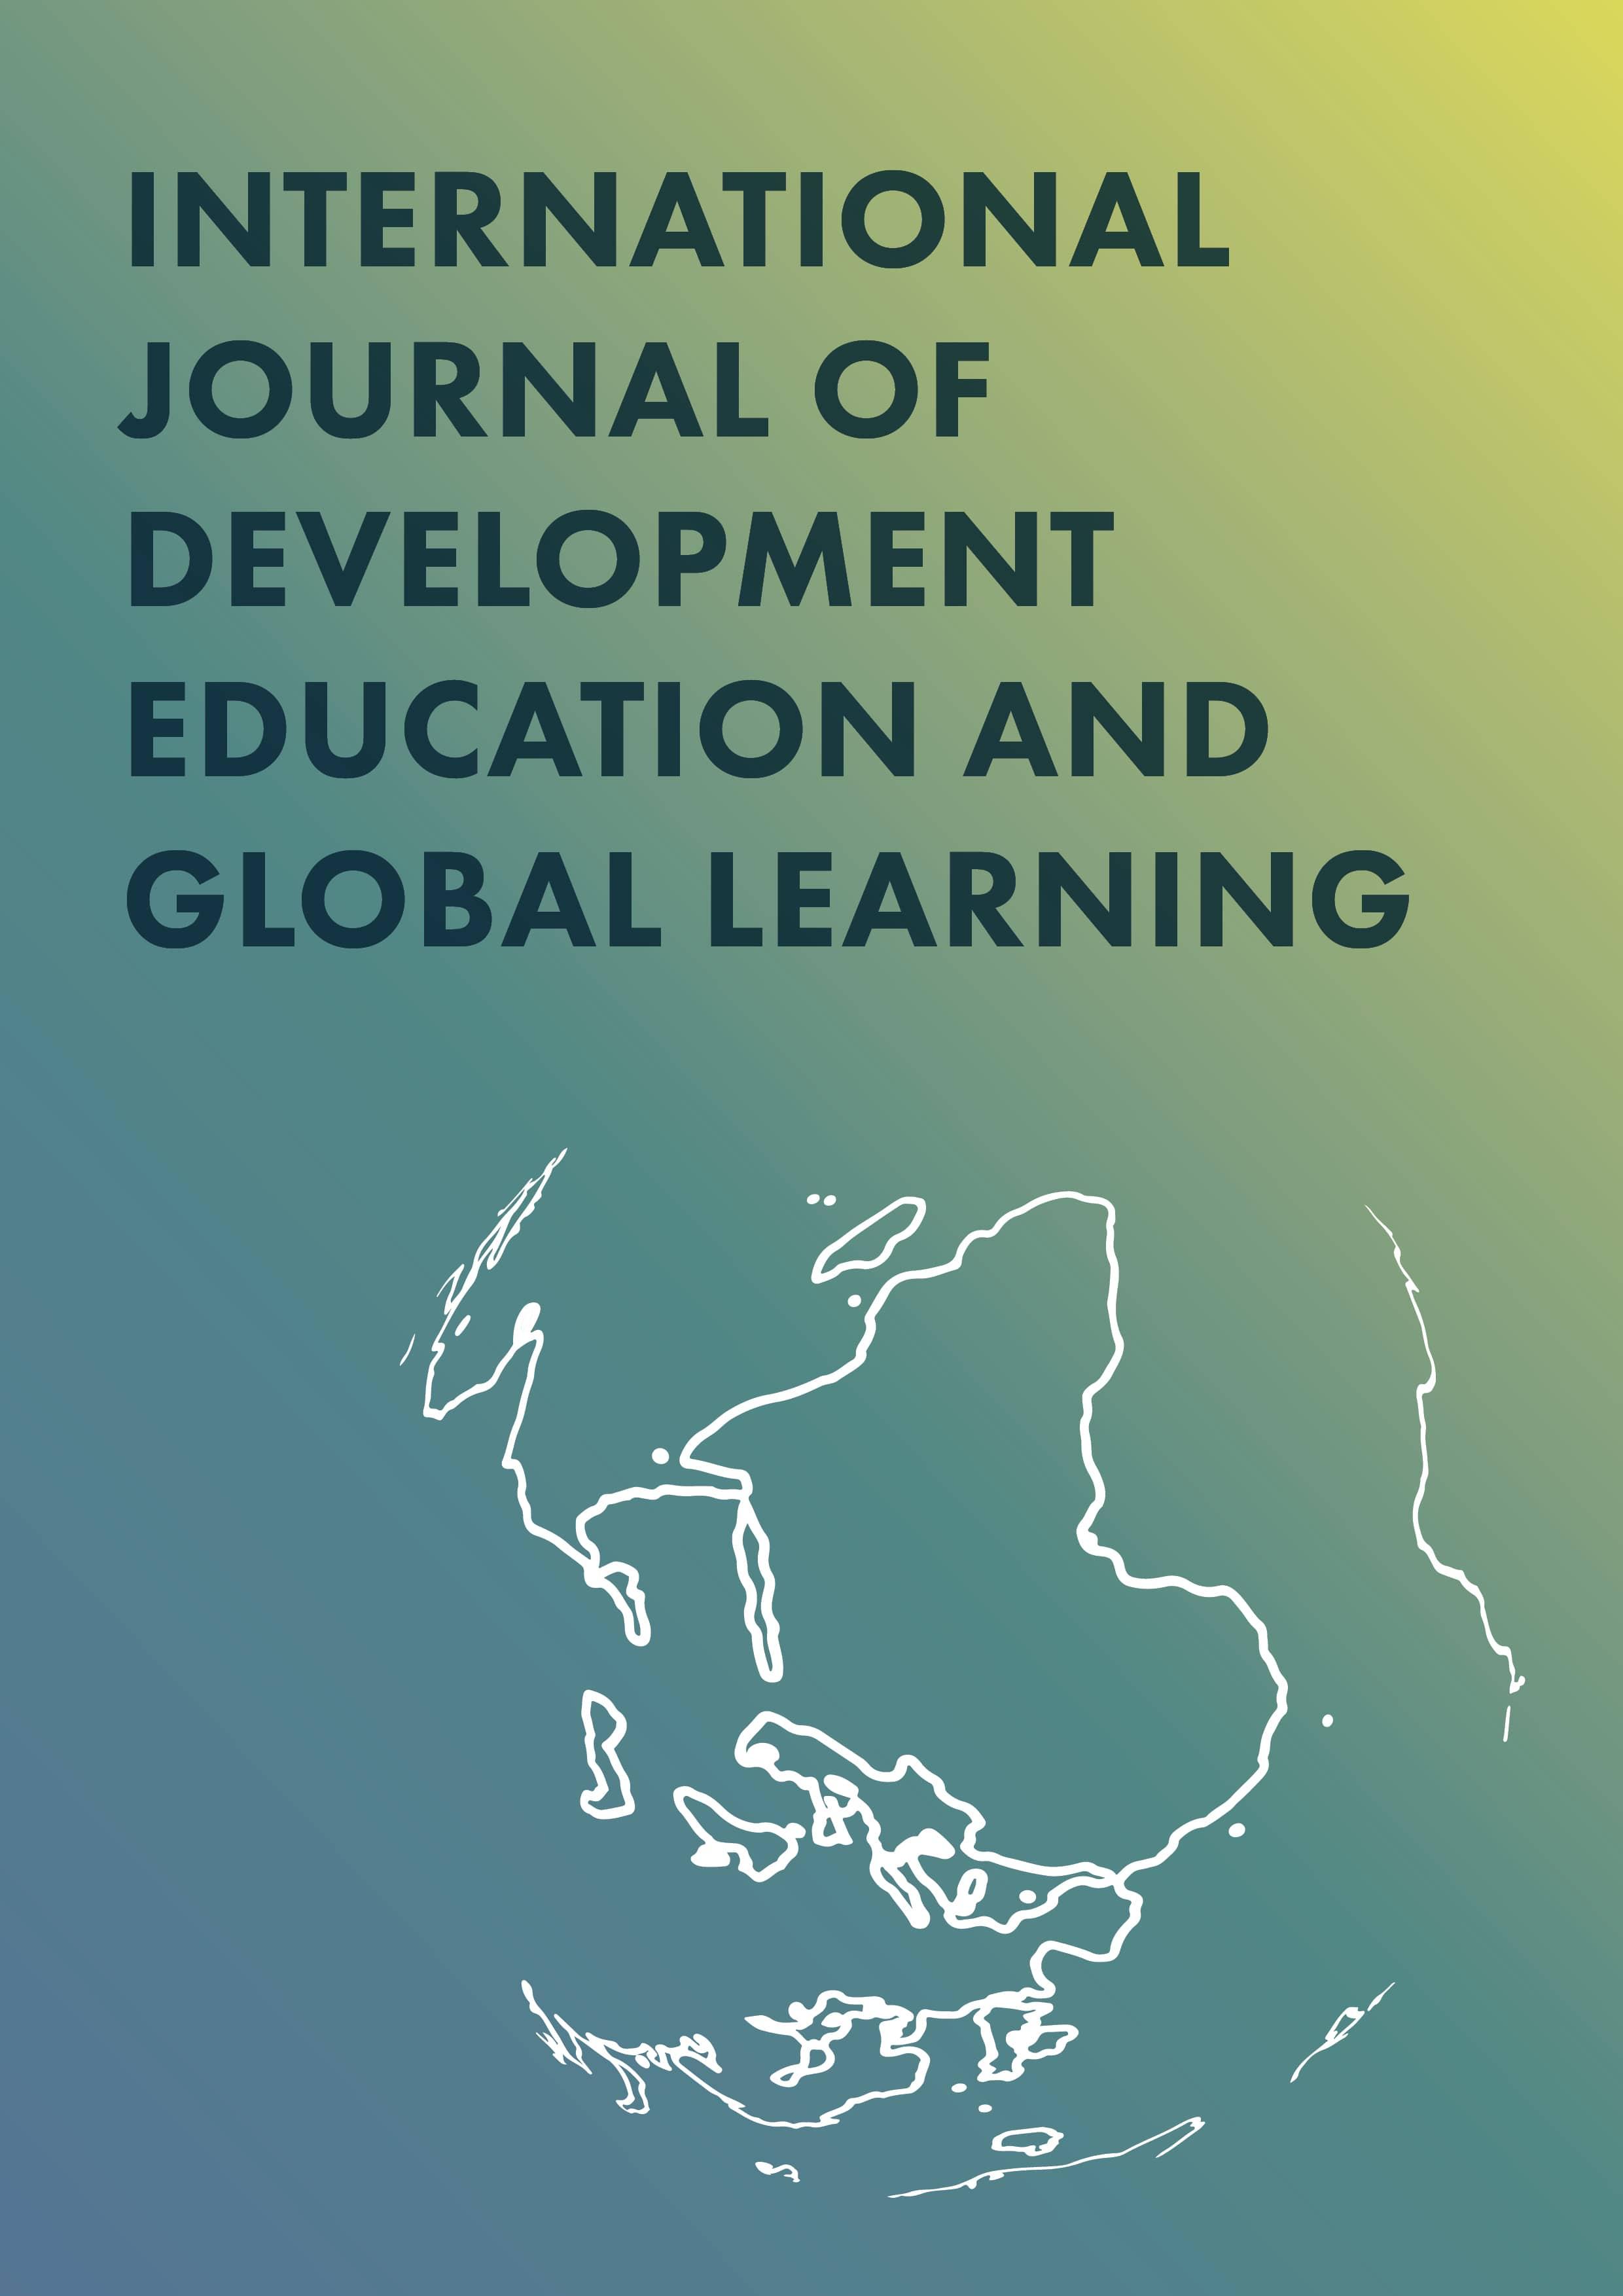 Poziv za prispevke za International Journal of Development Education and global learning